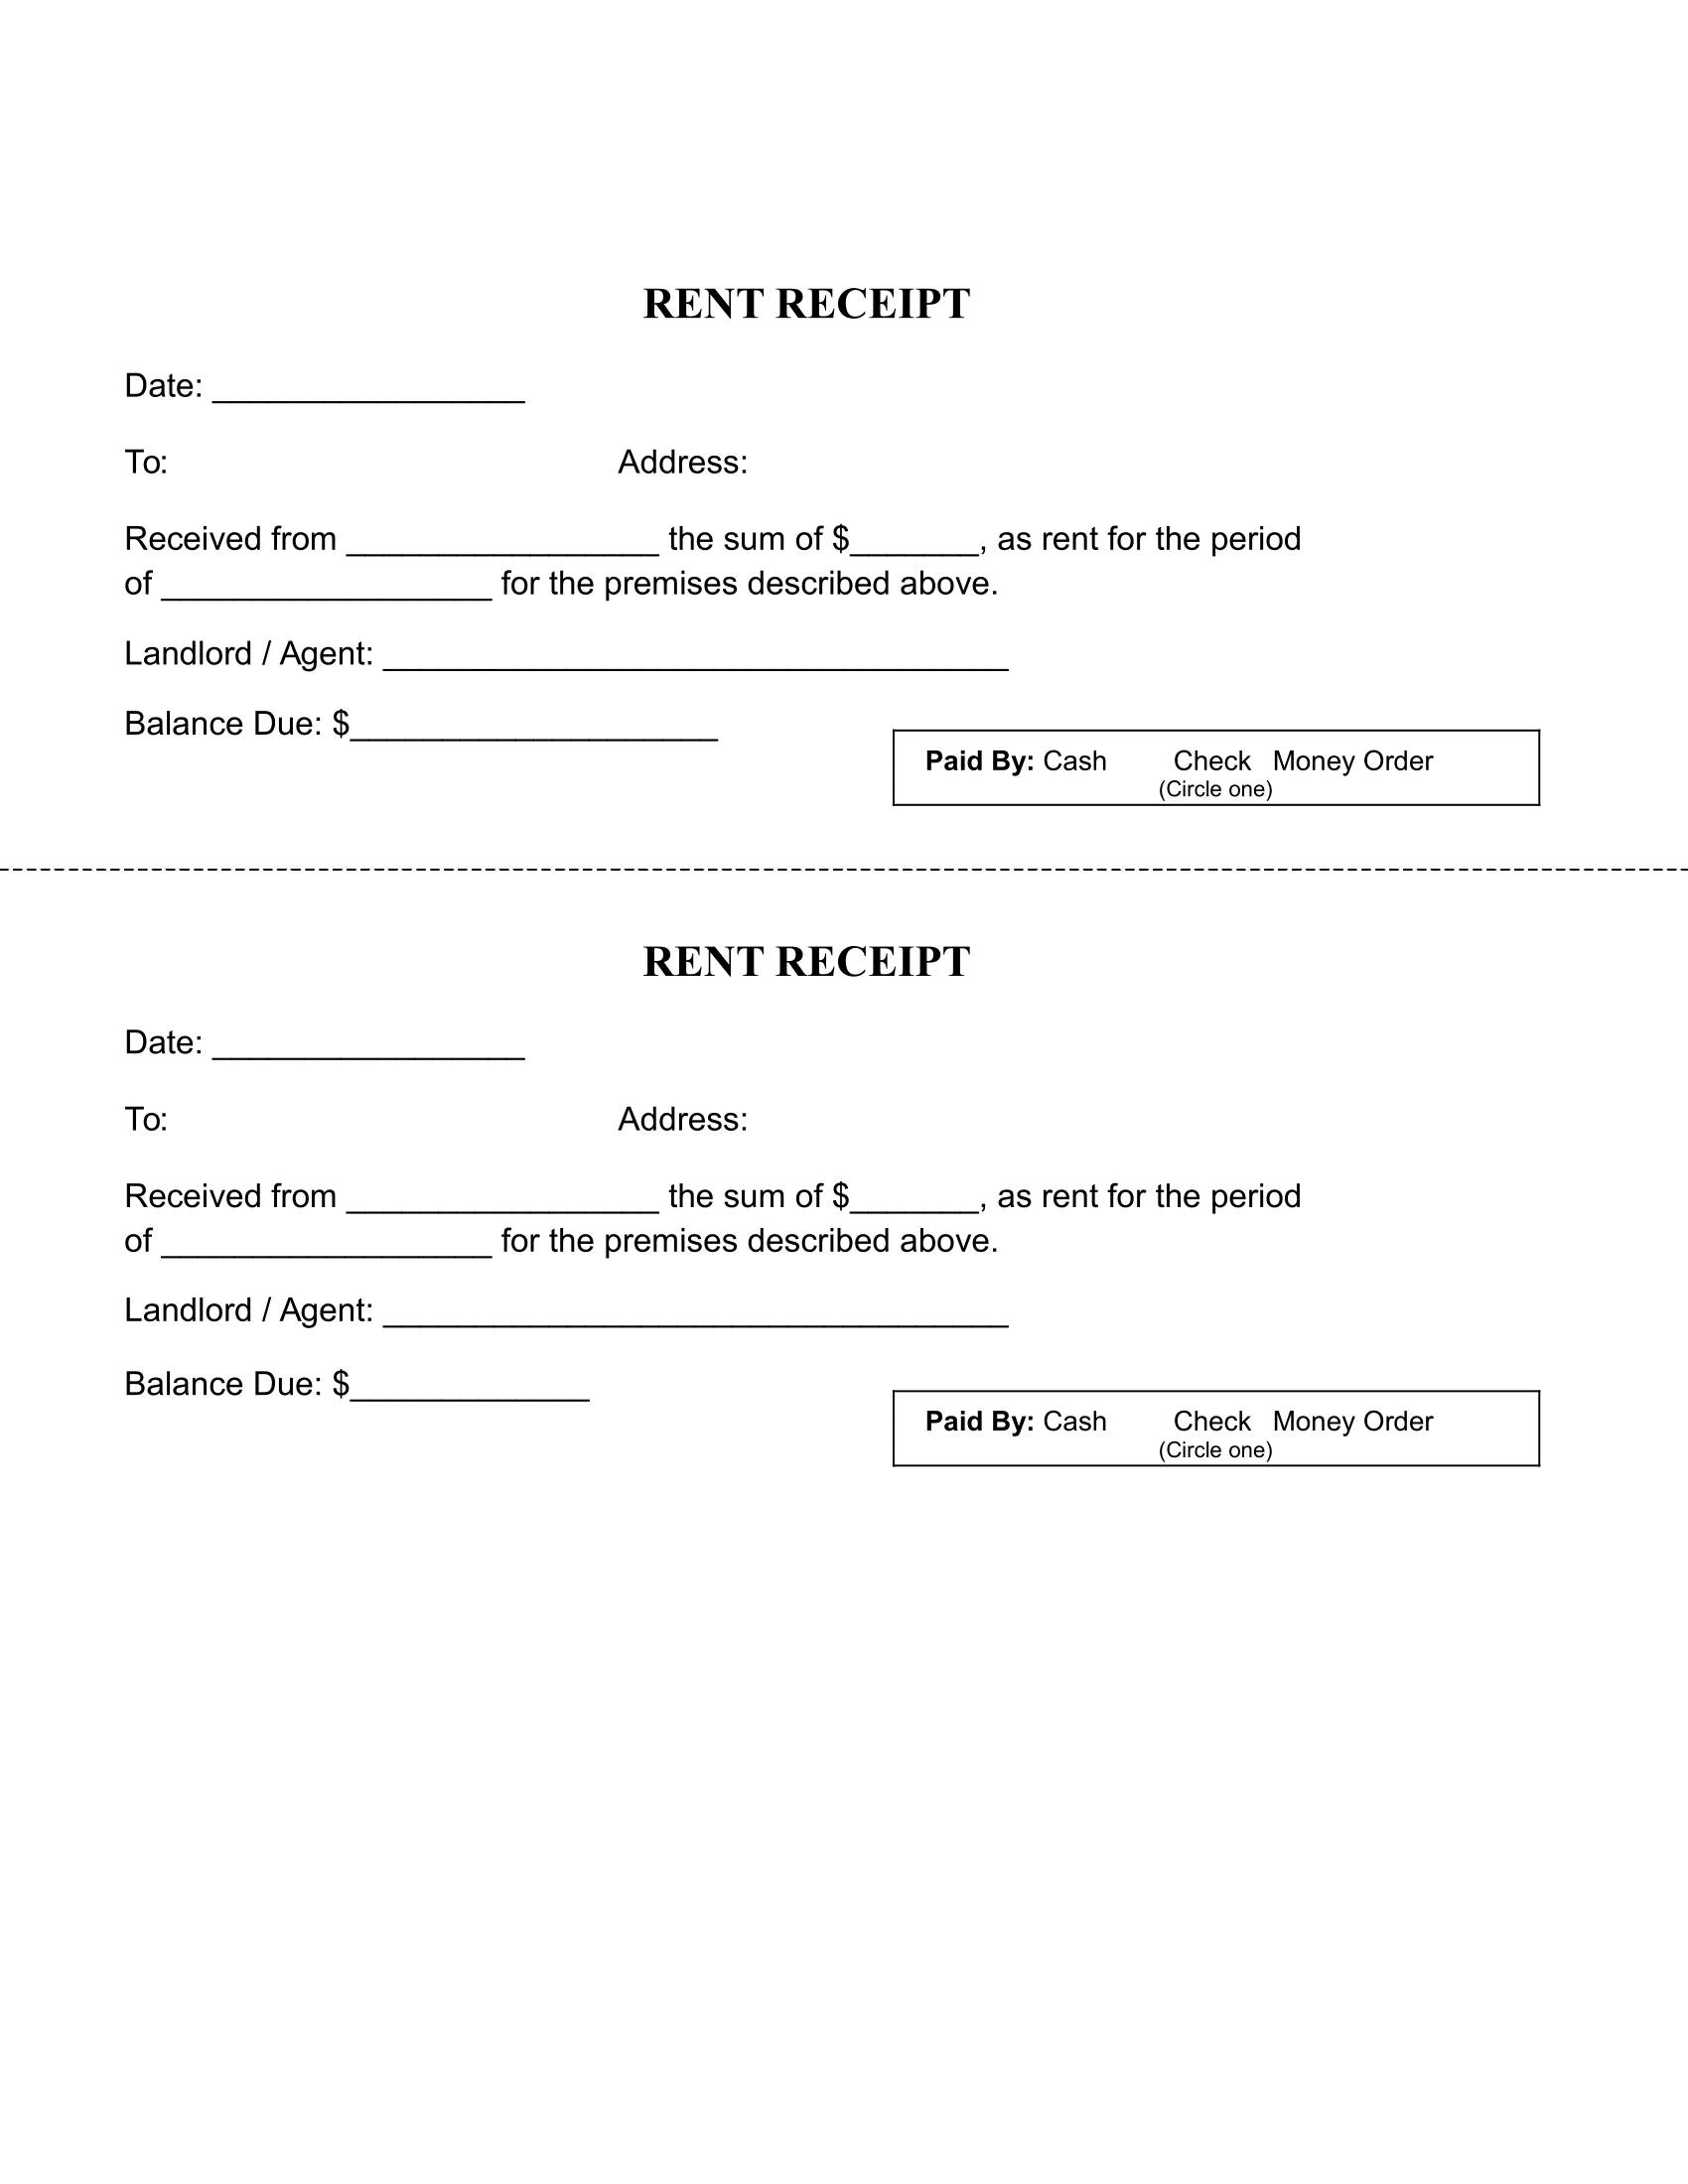 Rent Receipt Sample